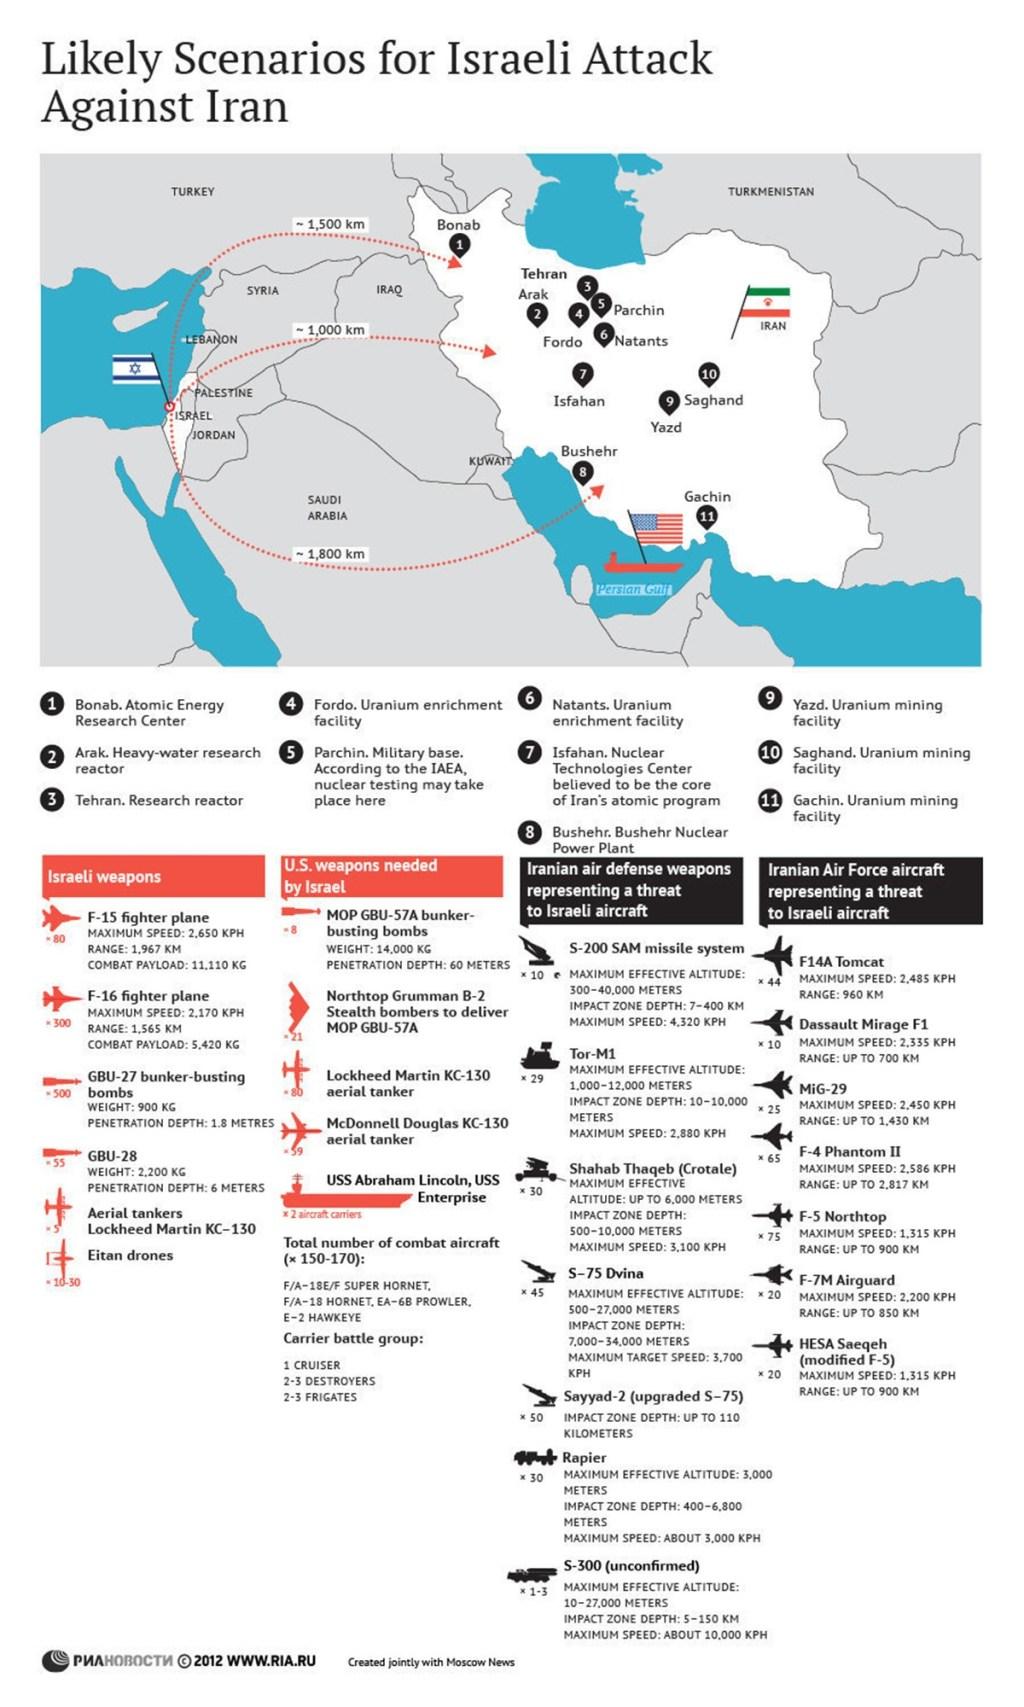 00-ria-novosti-infographics-likely-scenarios-for-israeli-attack-against-iran-2012